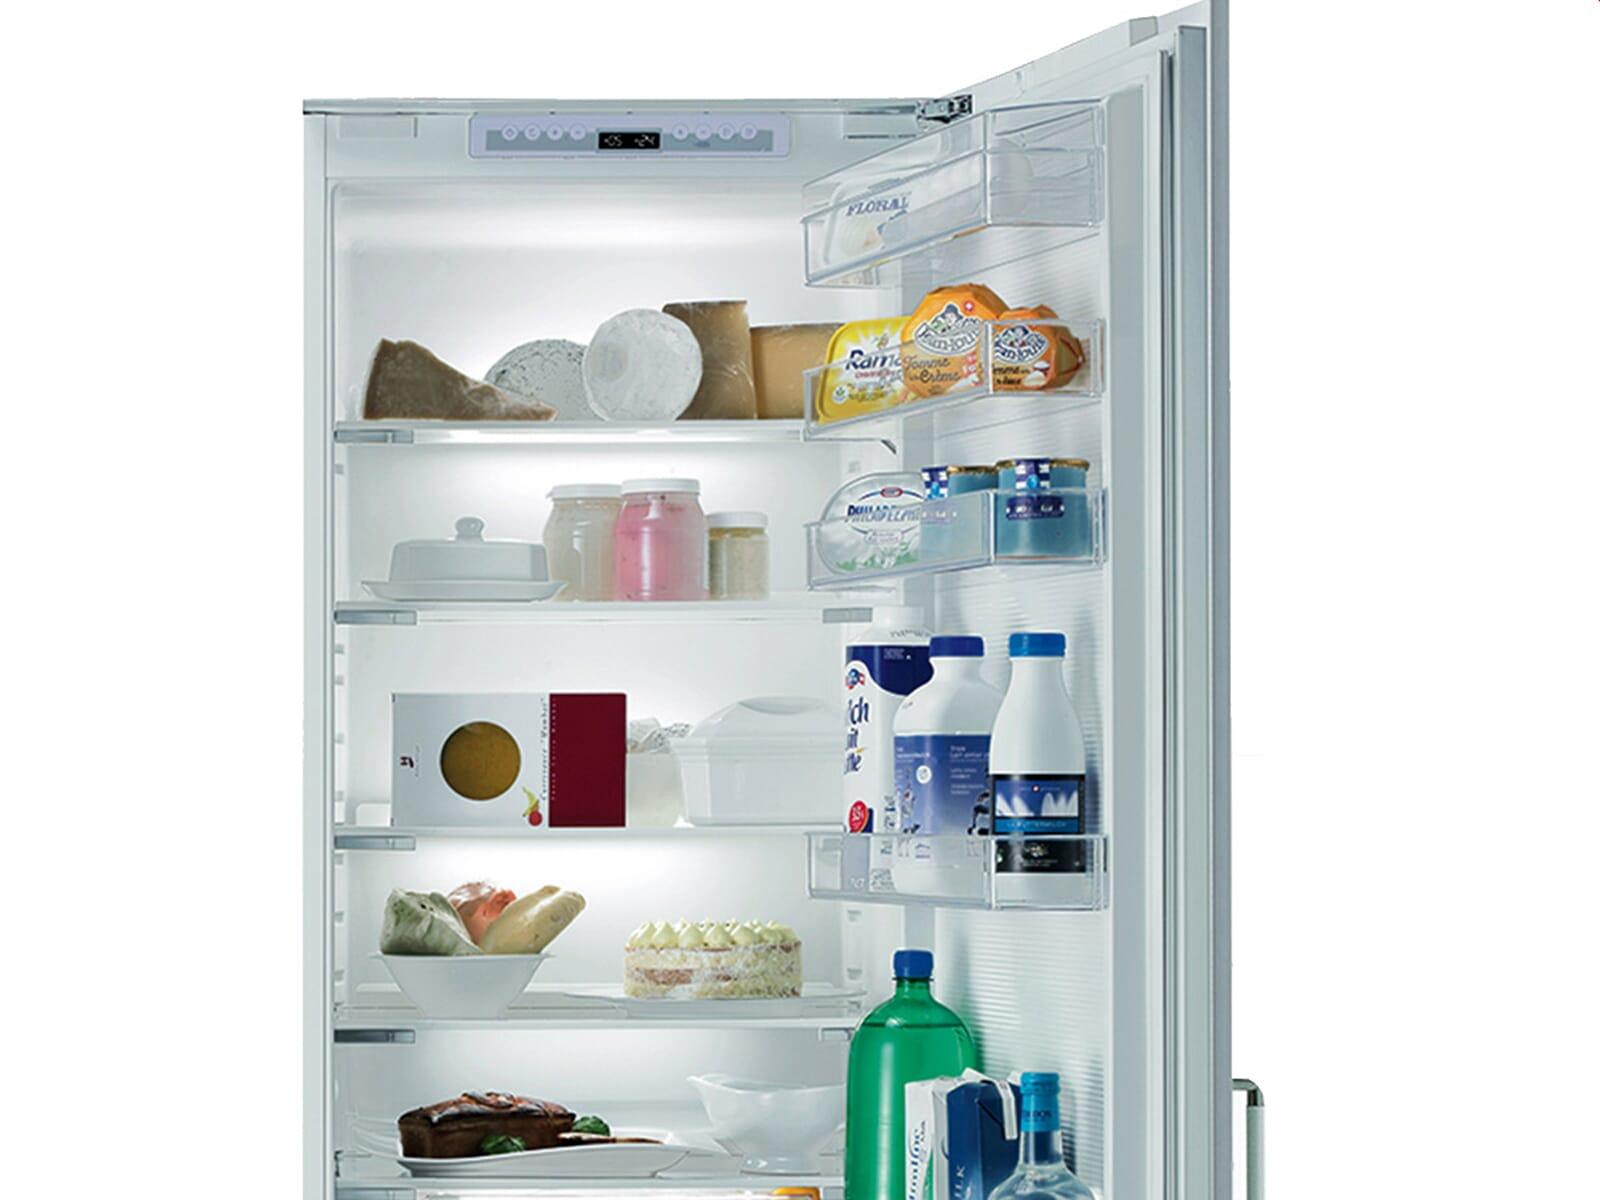 Smeg Kühlschrank Wikipedia : Kühlschrank bedienungsanleitung v zug prestige hashimoto kimberly blog